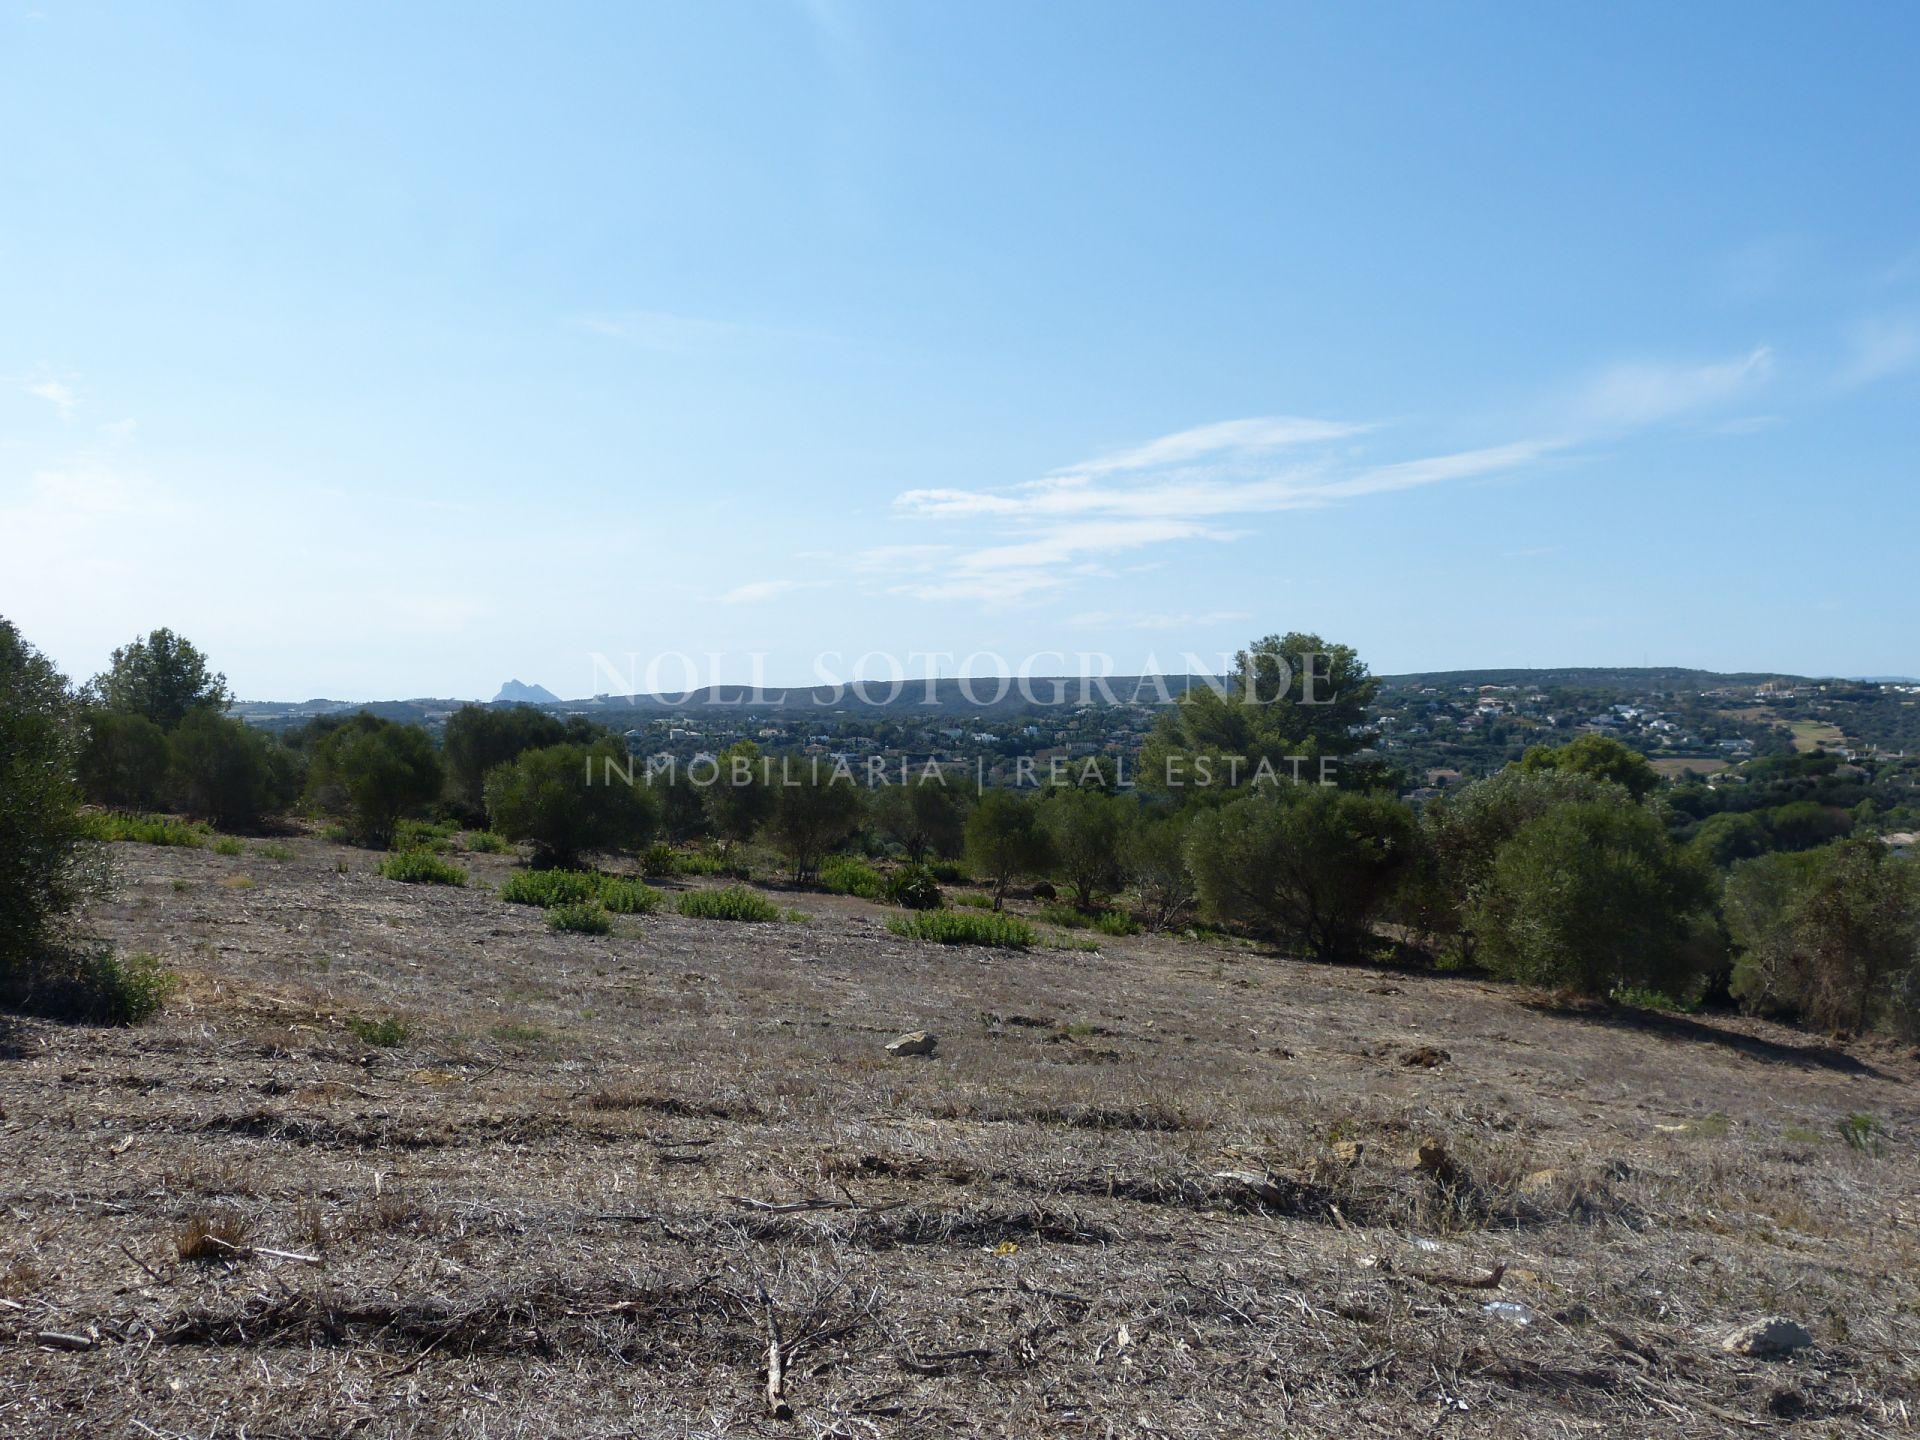 Building Plot for Sale in La Reserva Sotogrande